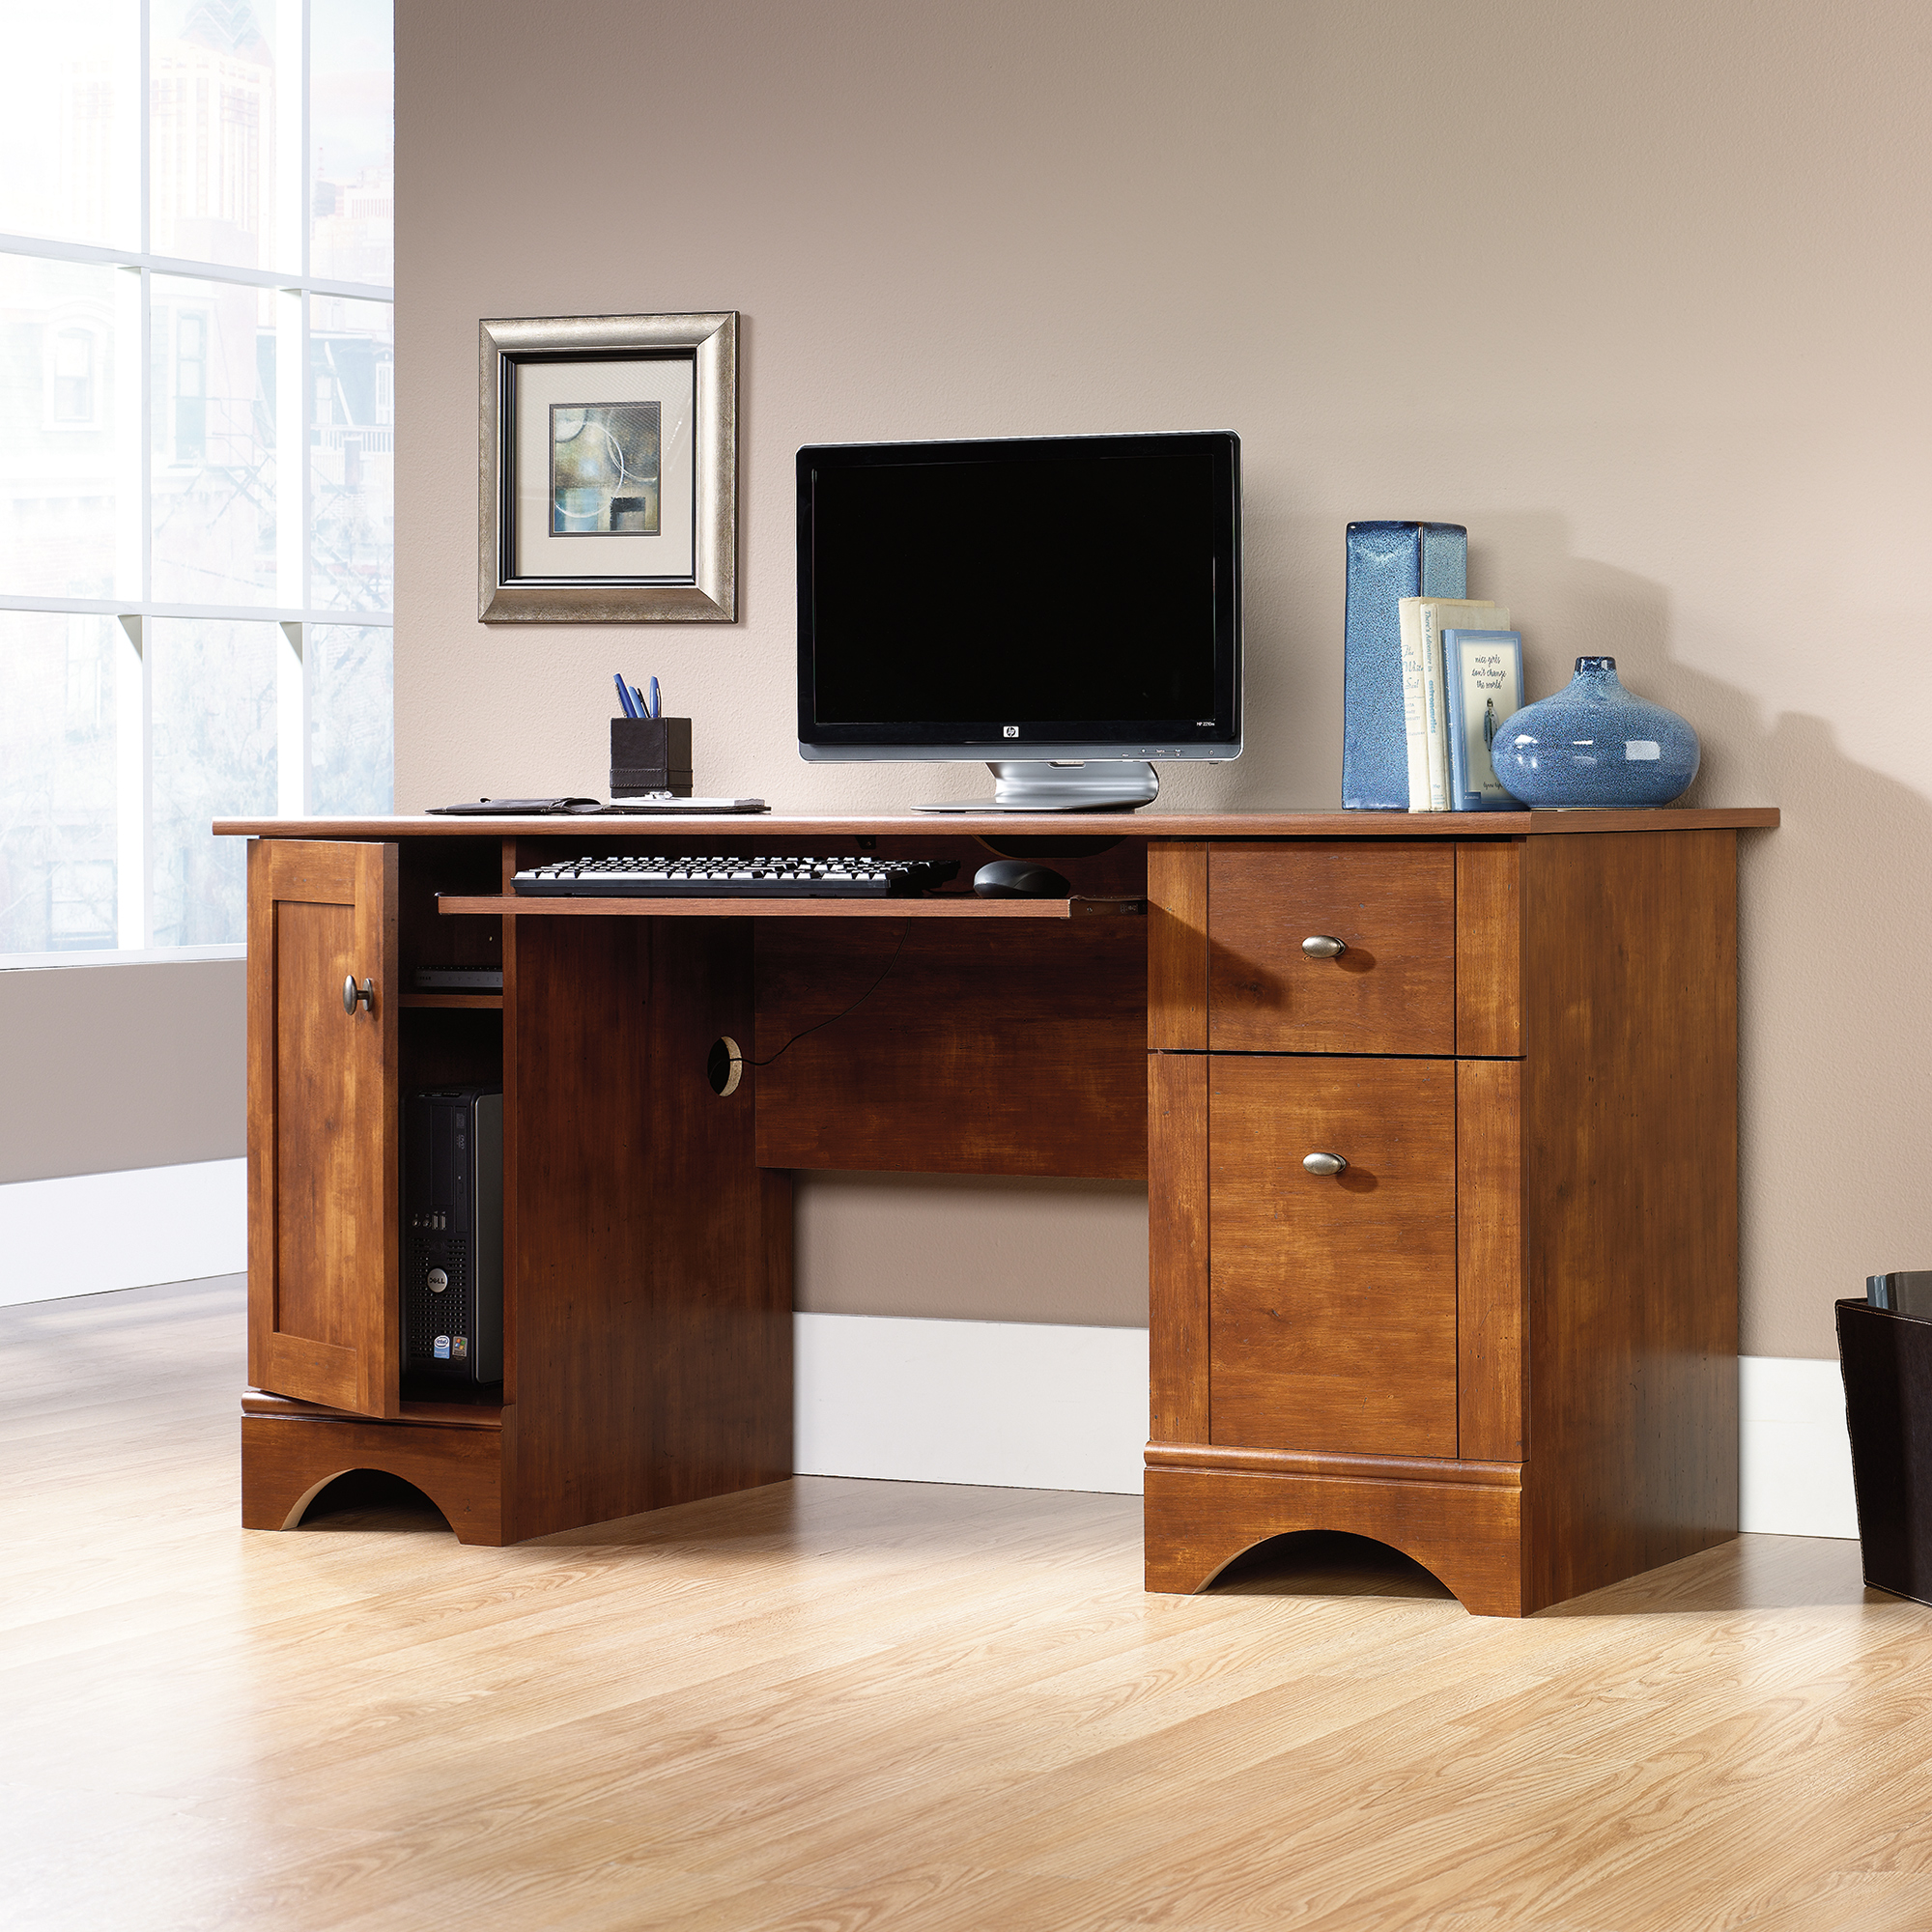 Sauder Select Computer Desk (402375) – Sauder